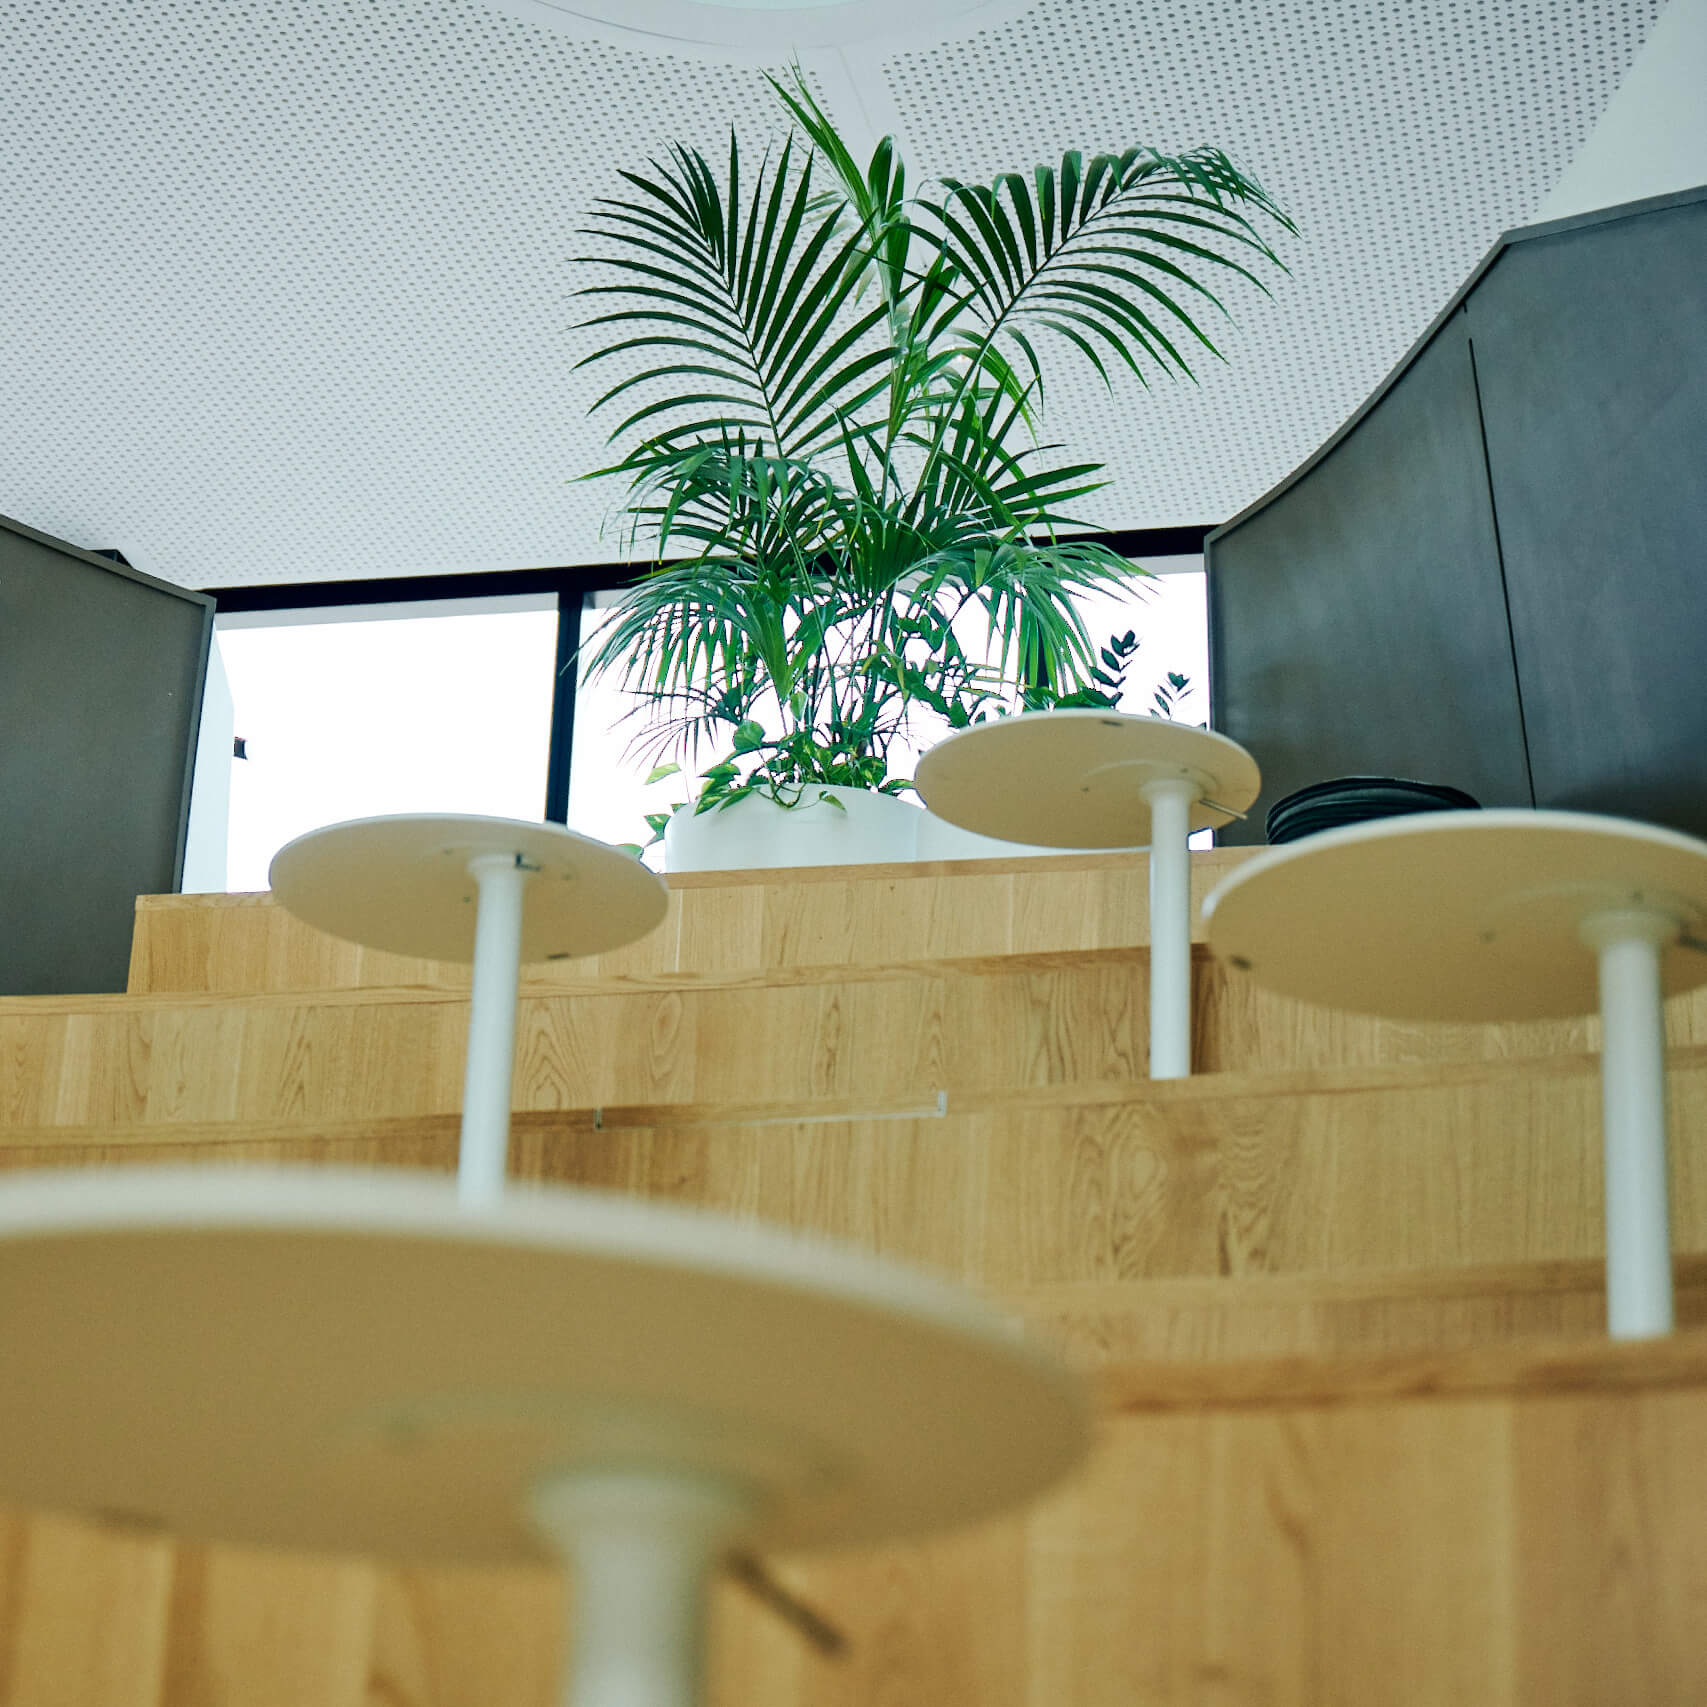 portfolio-offices-spaces-foodstuffs-image2